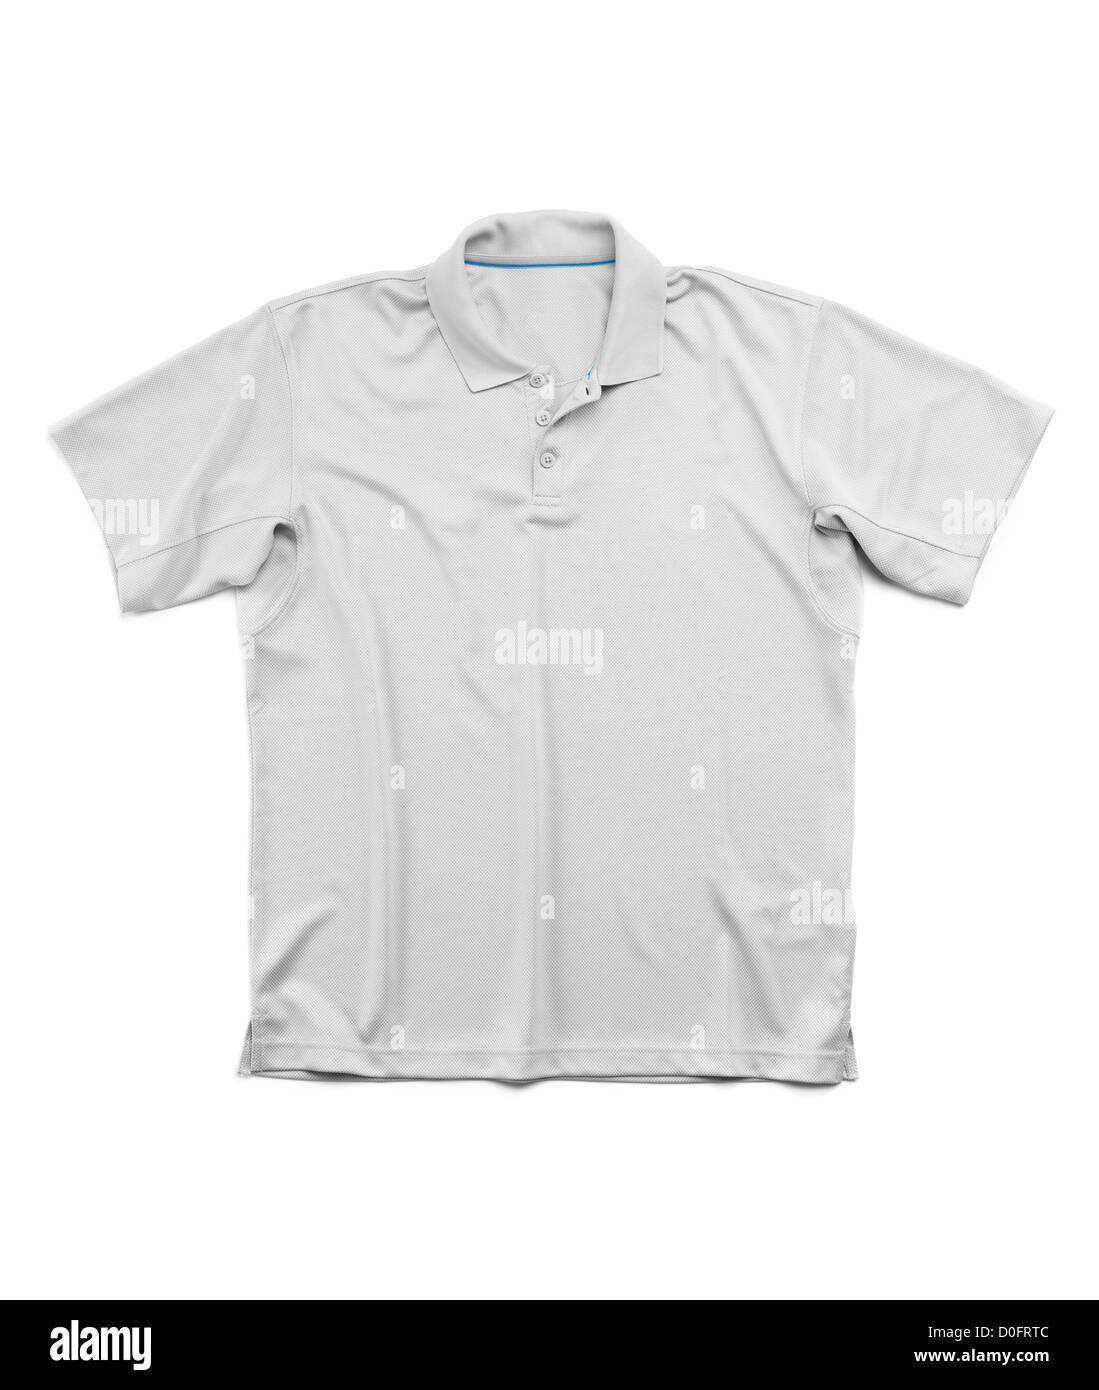 Mens verano gris camiseta manga corta polo aislado sobre fondo blanco. Imagen De Stock